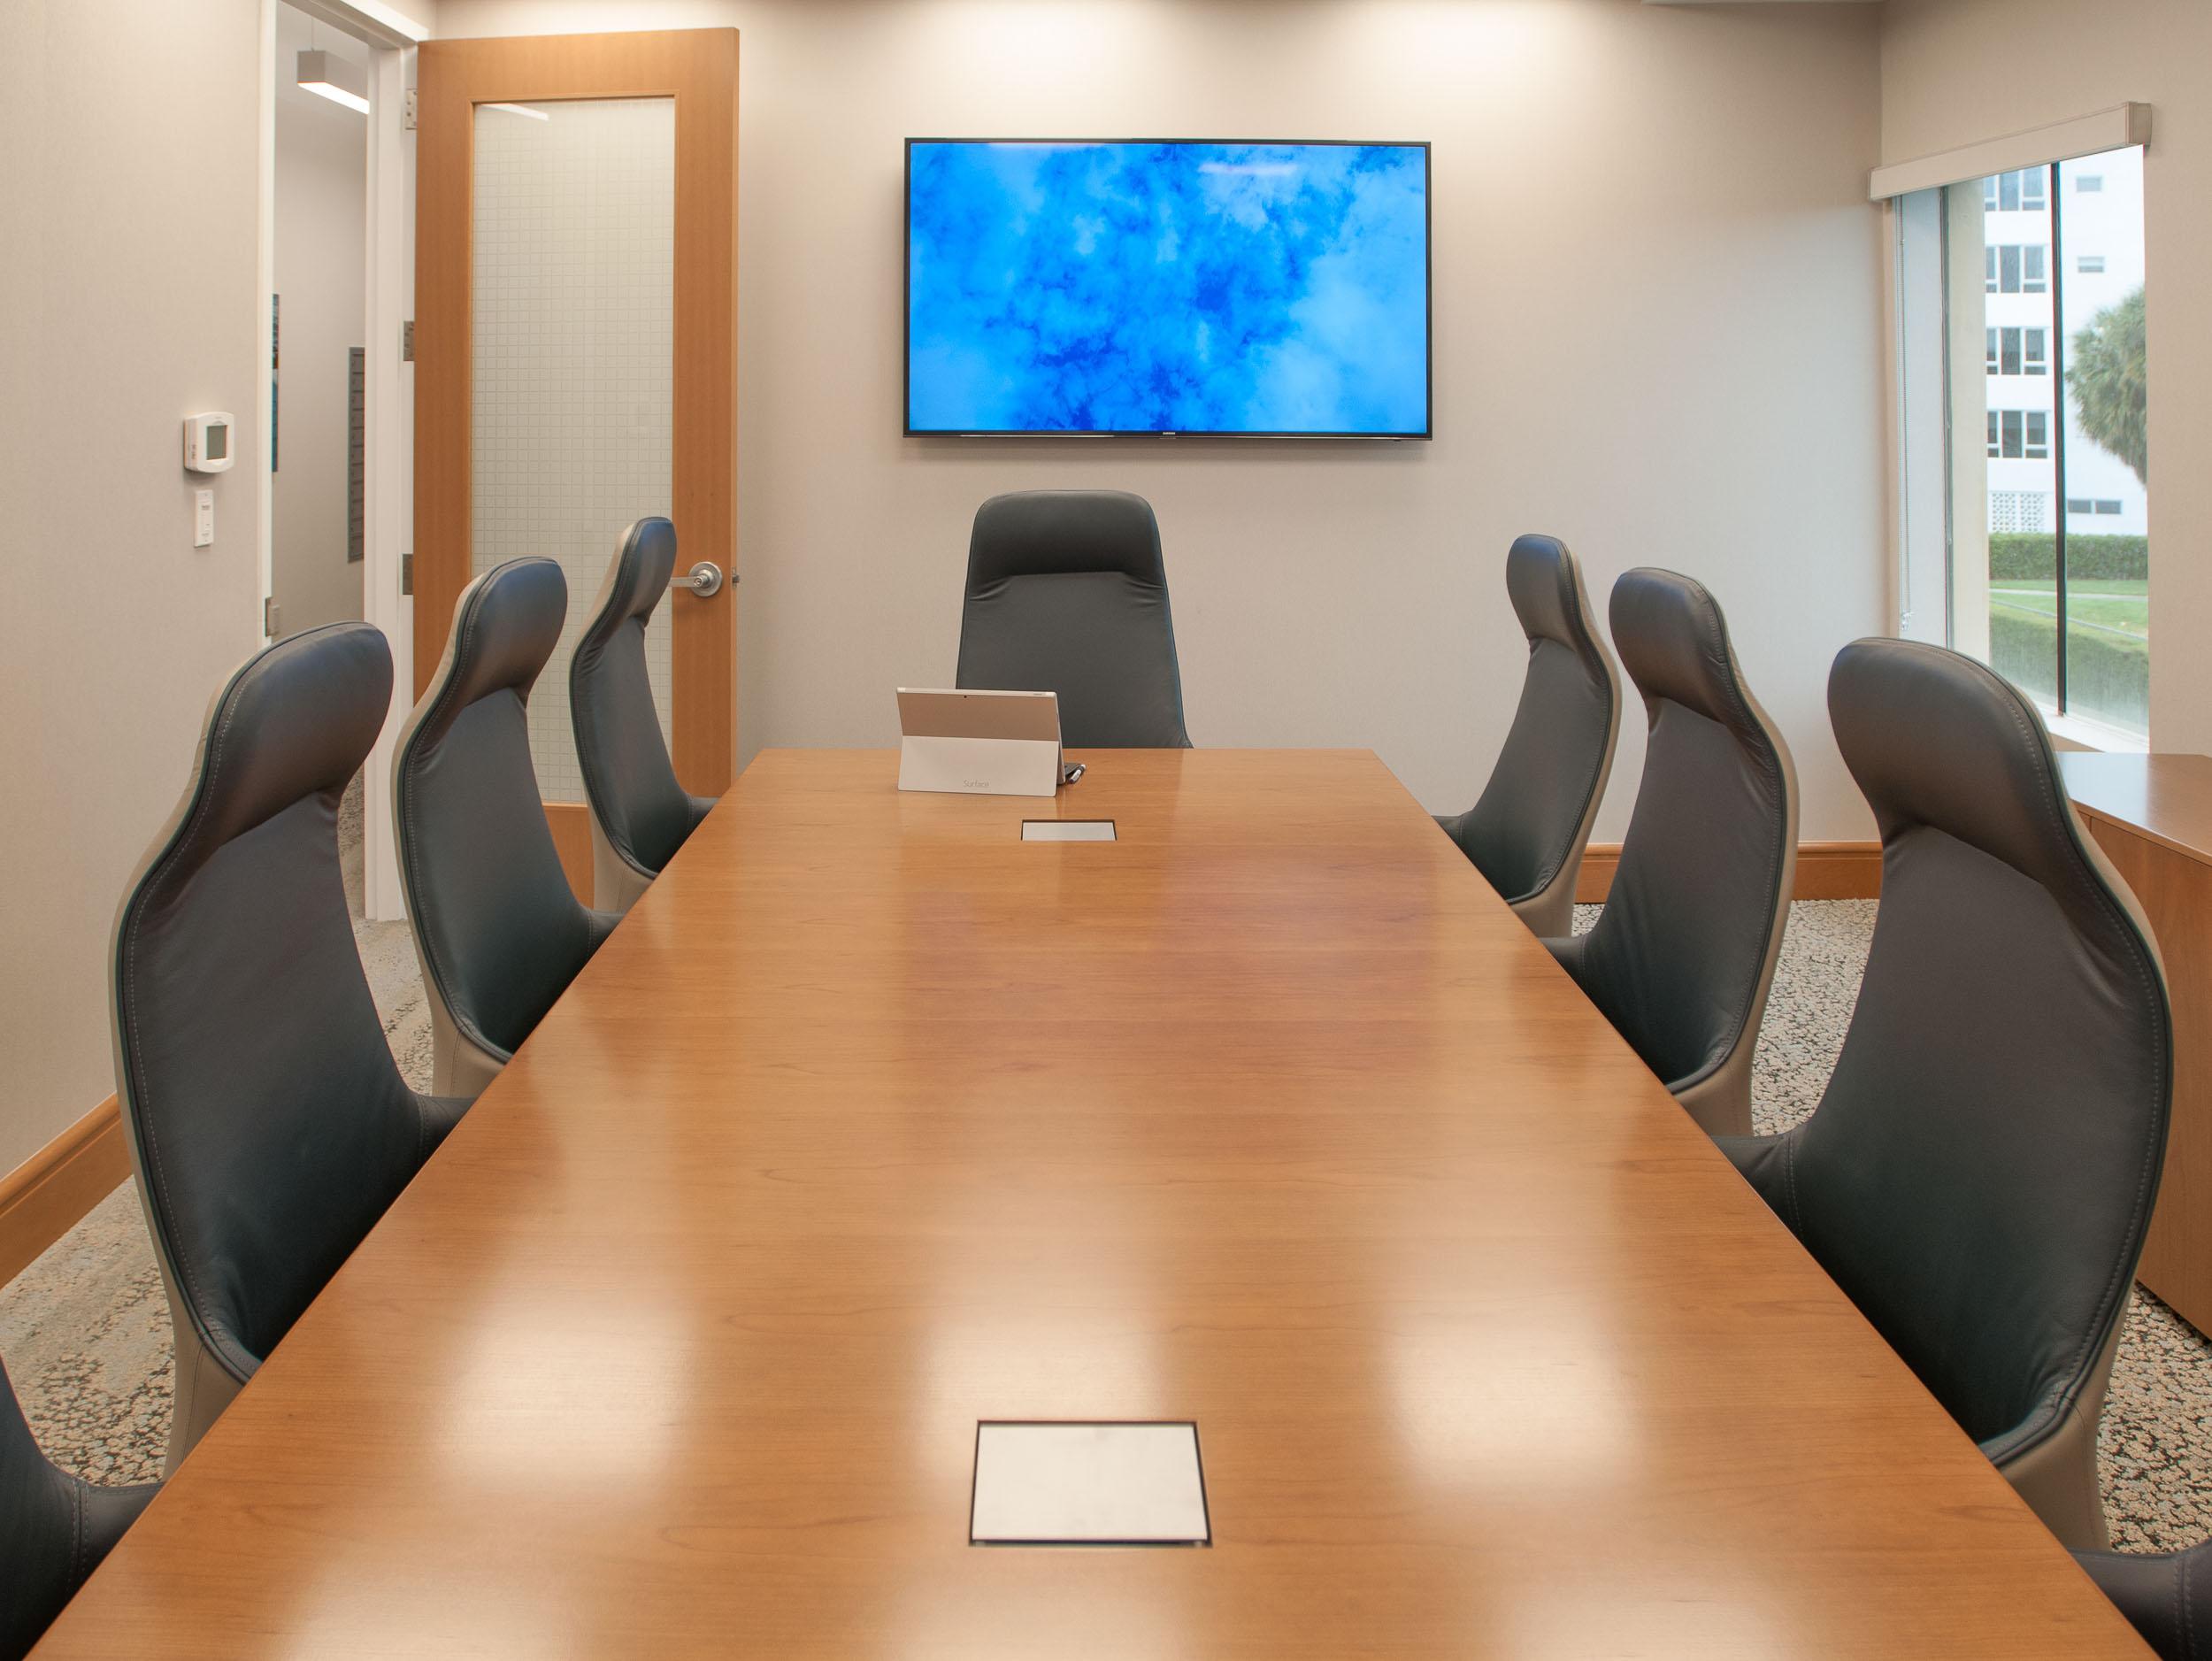 Board Room Rental 2 Palm Beach-3552.jpg